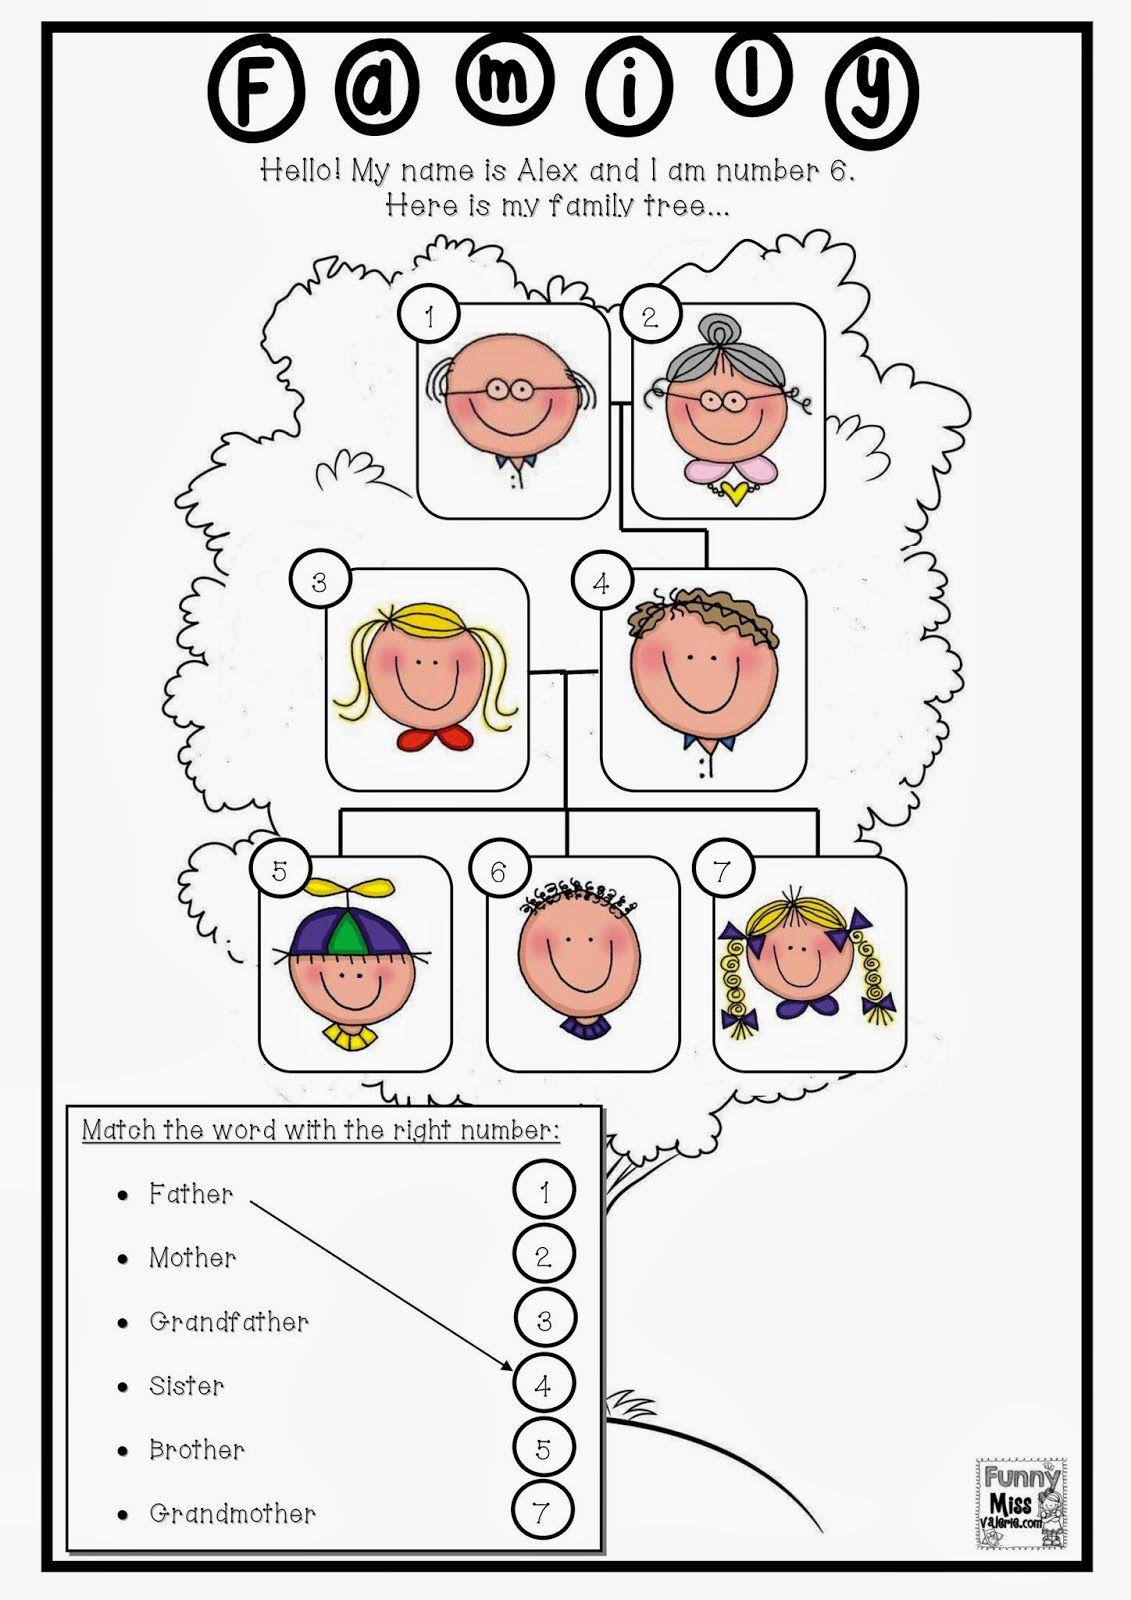 hight resolution of Enchanting Worksheets On Family For Grade 1 For Funny Miss Valà  Family  worksheet